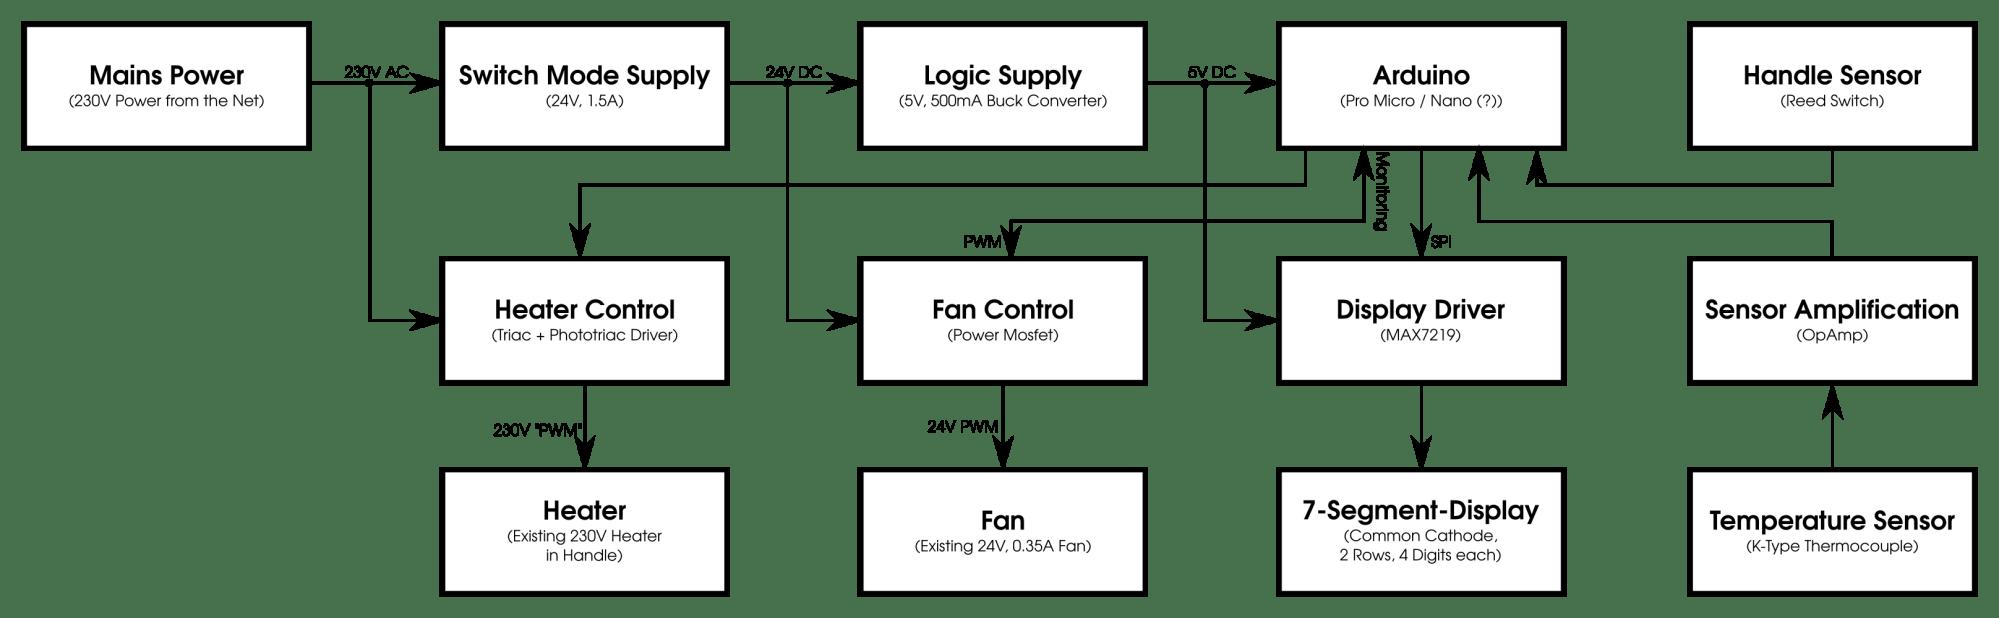 hight resolution of mac o x block diagram